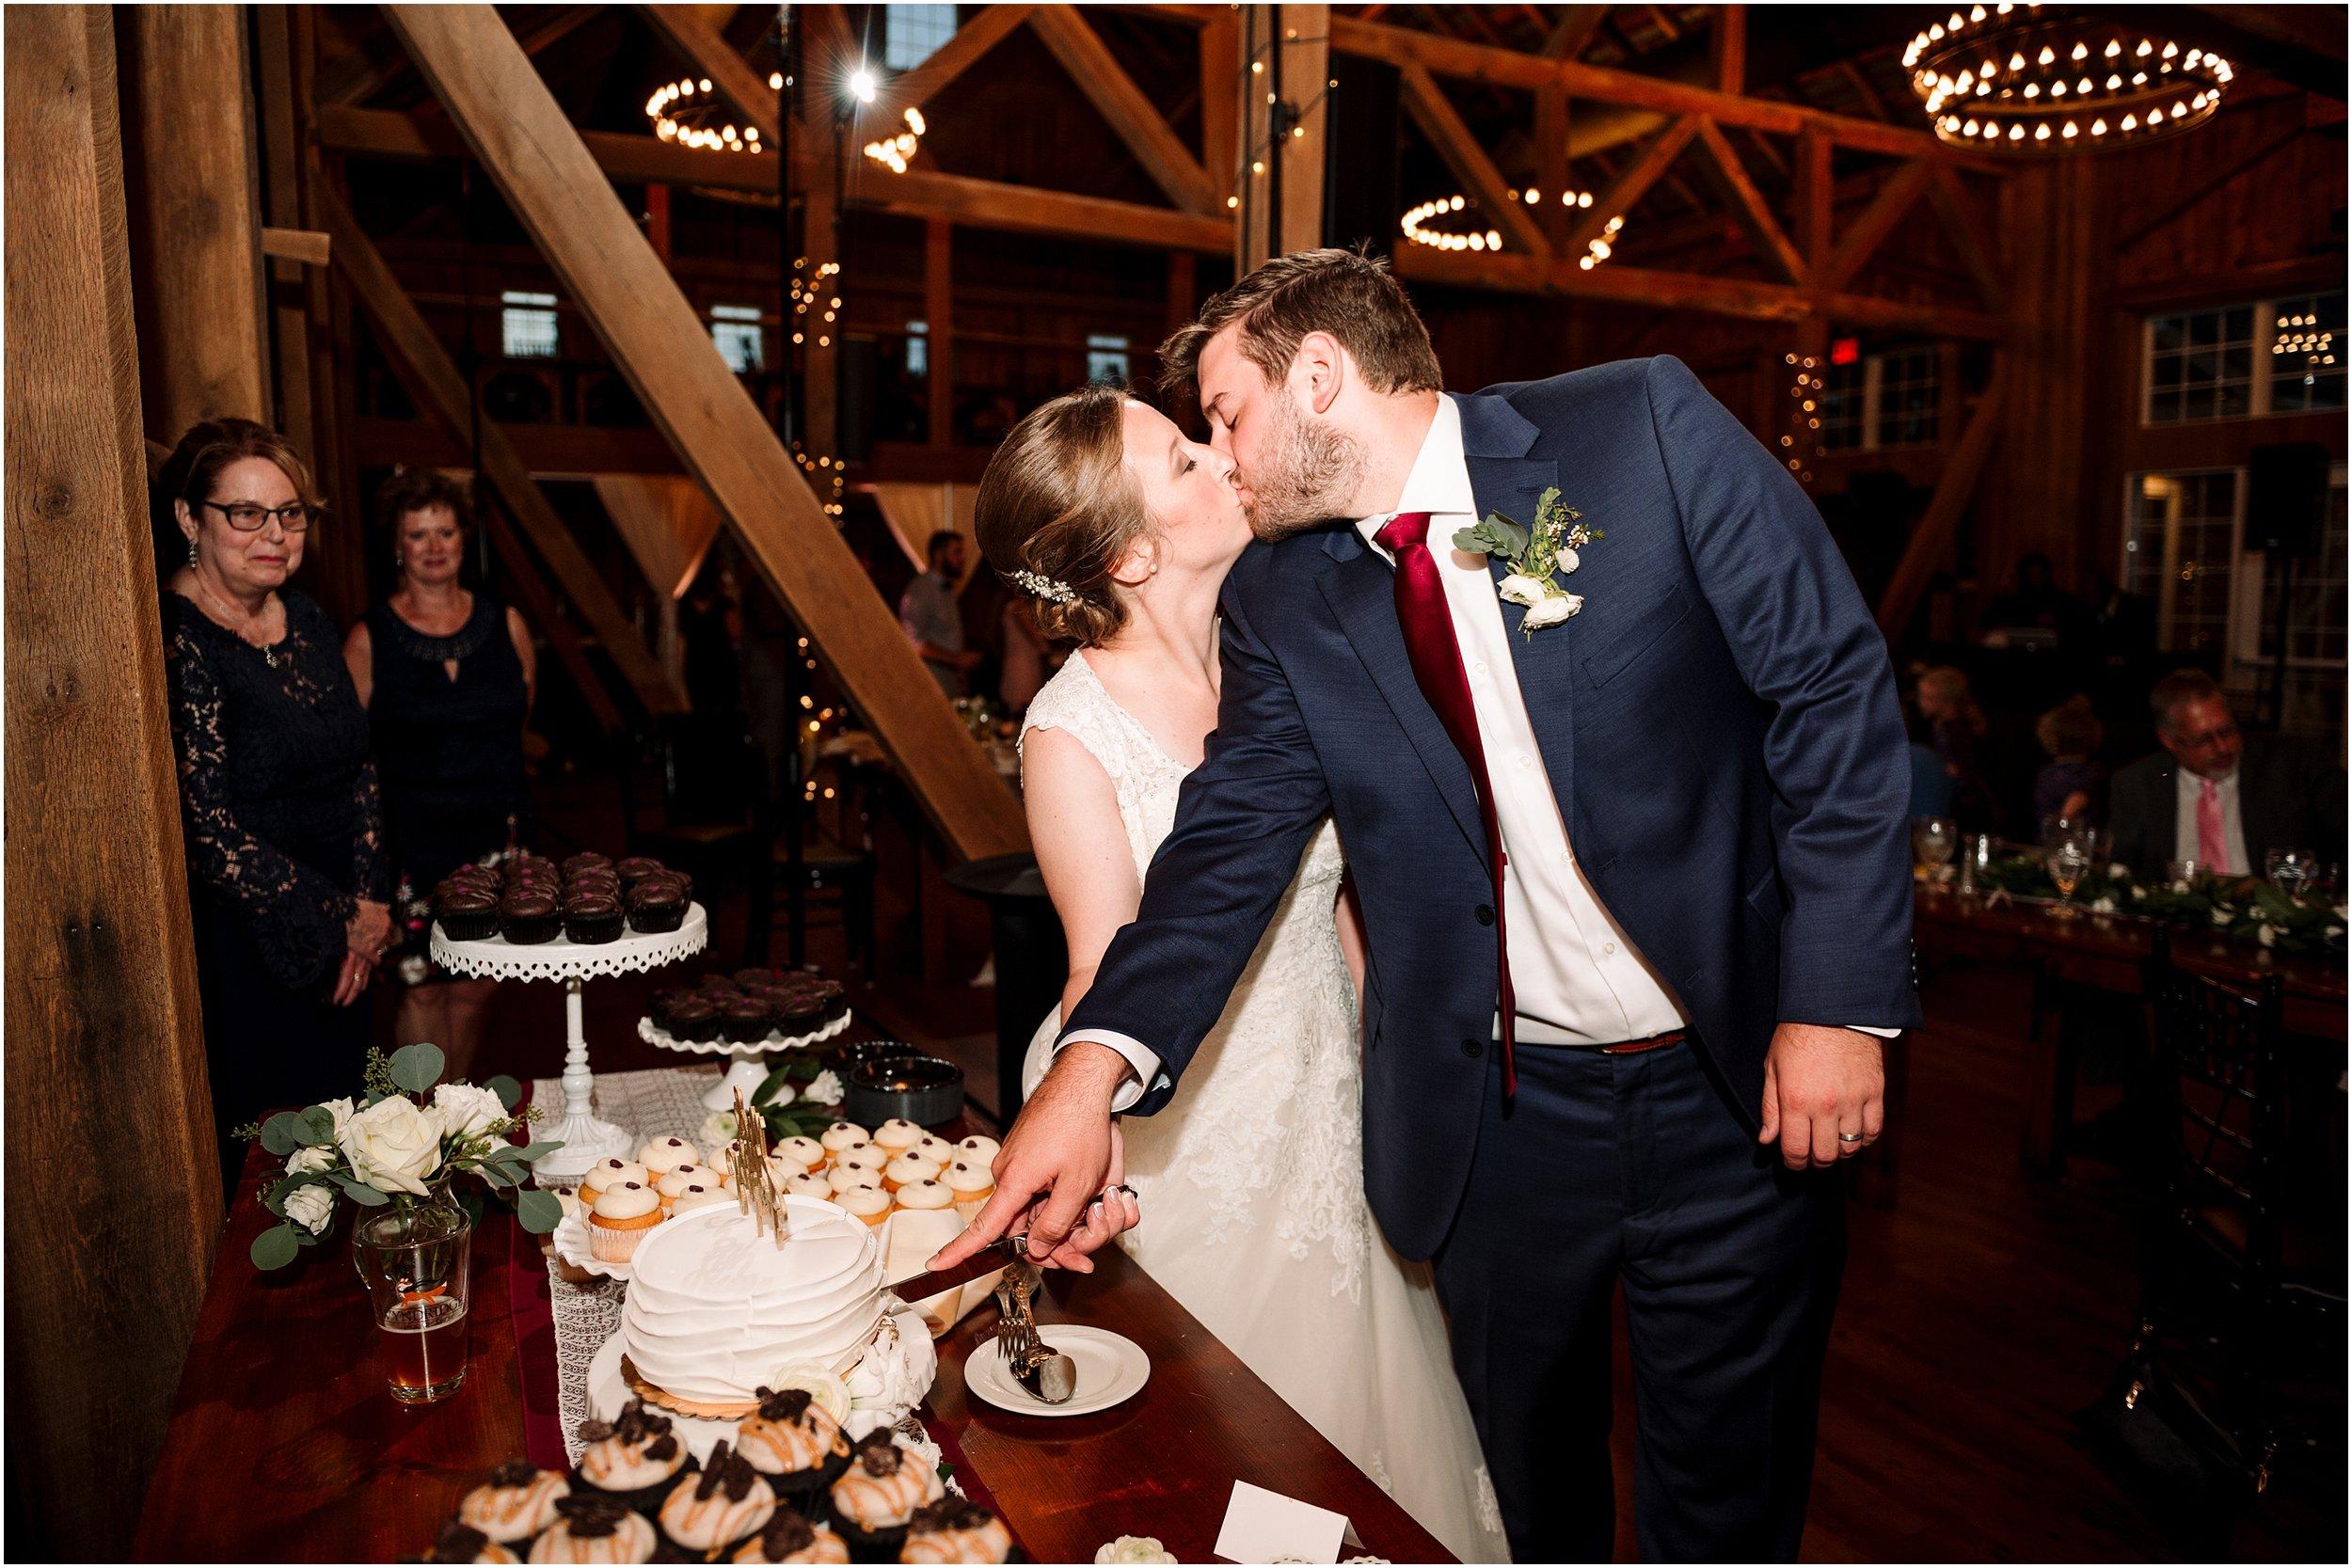 hannah leigh photography Wyndridge Farm Wedding York PA_1552.jpg